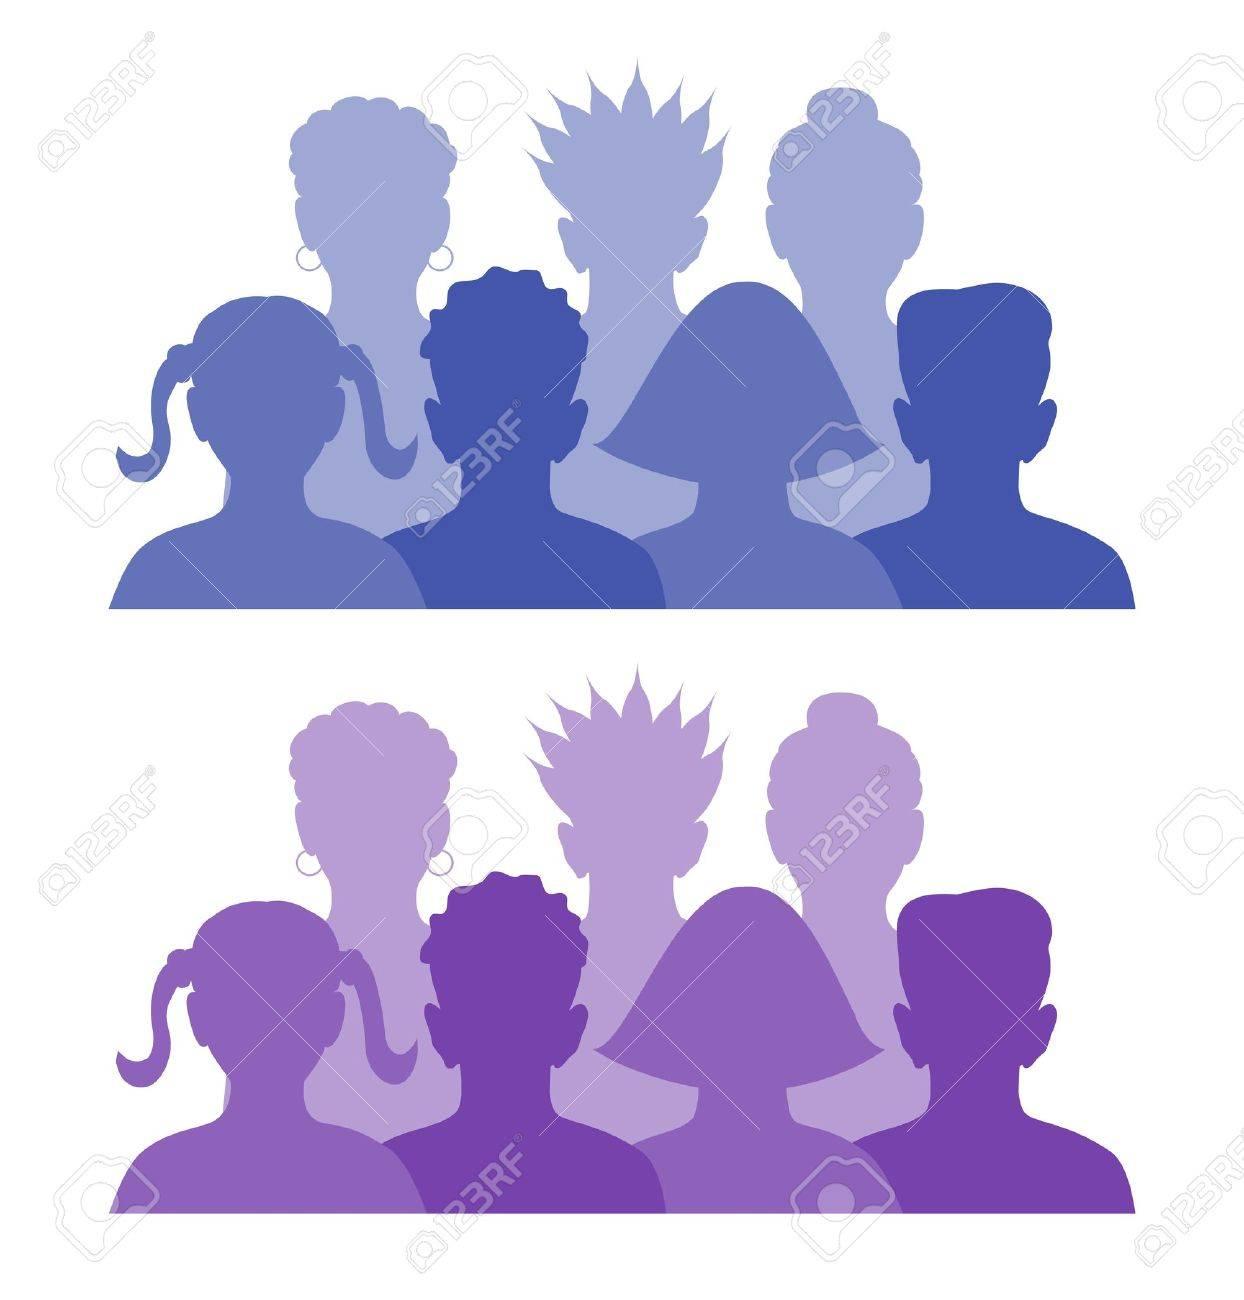 web groups icon Stock Vector - 14828486